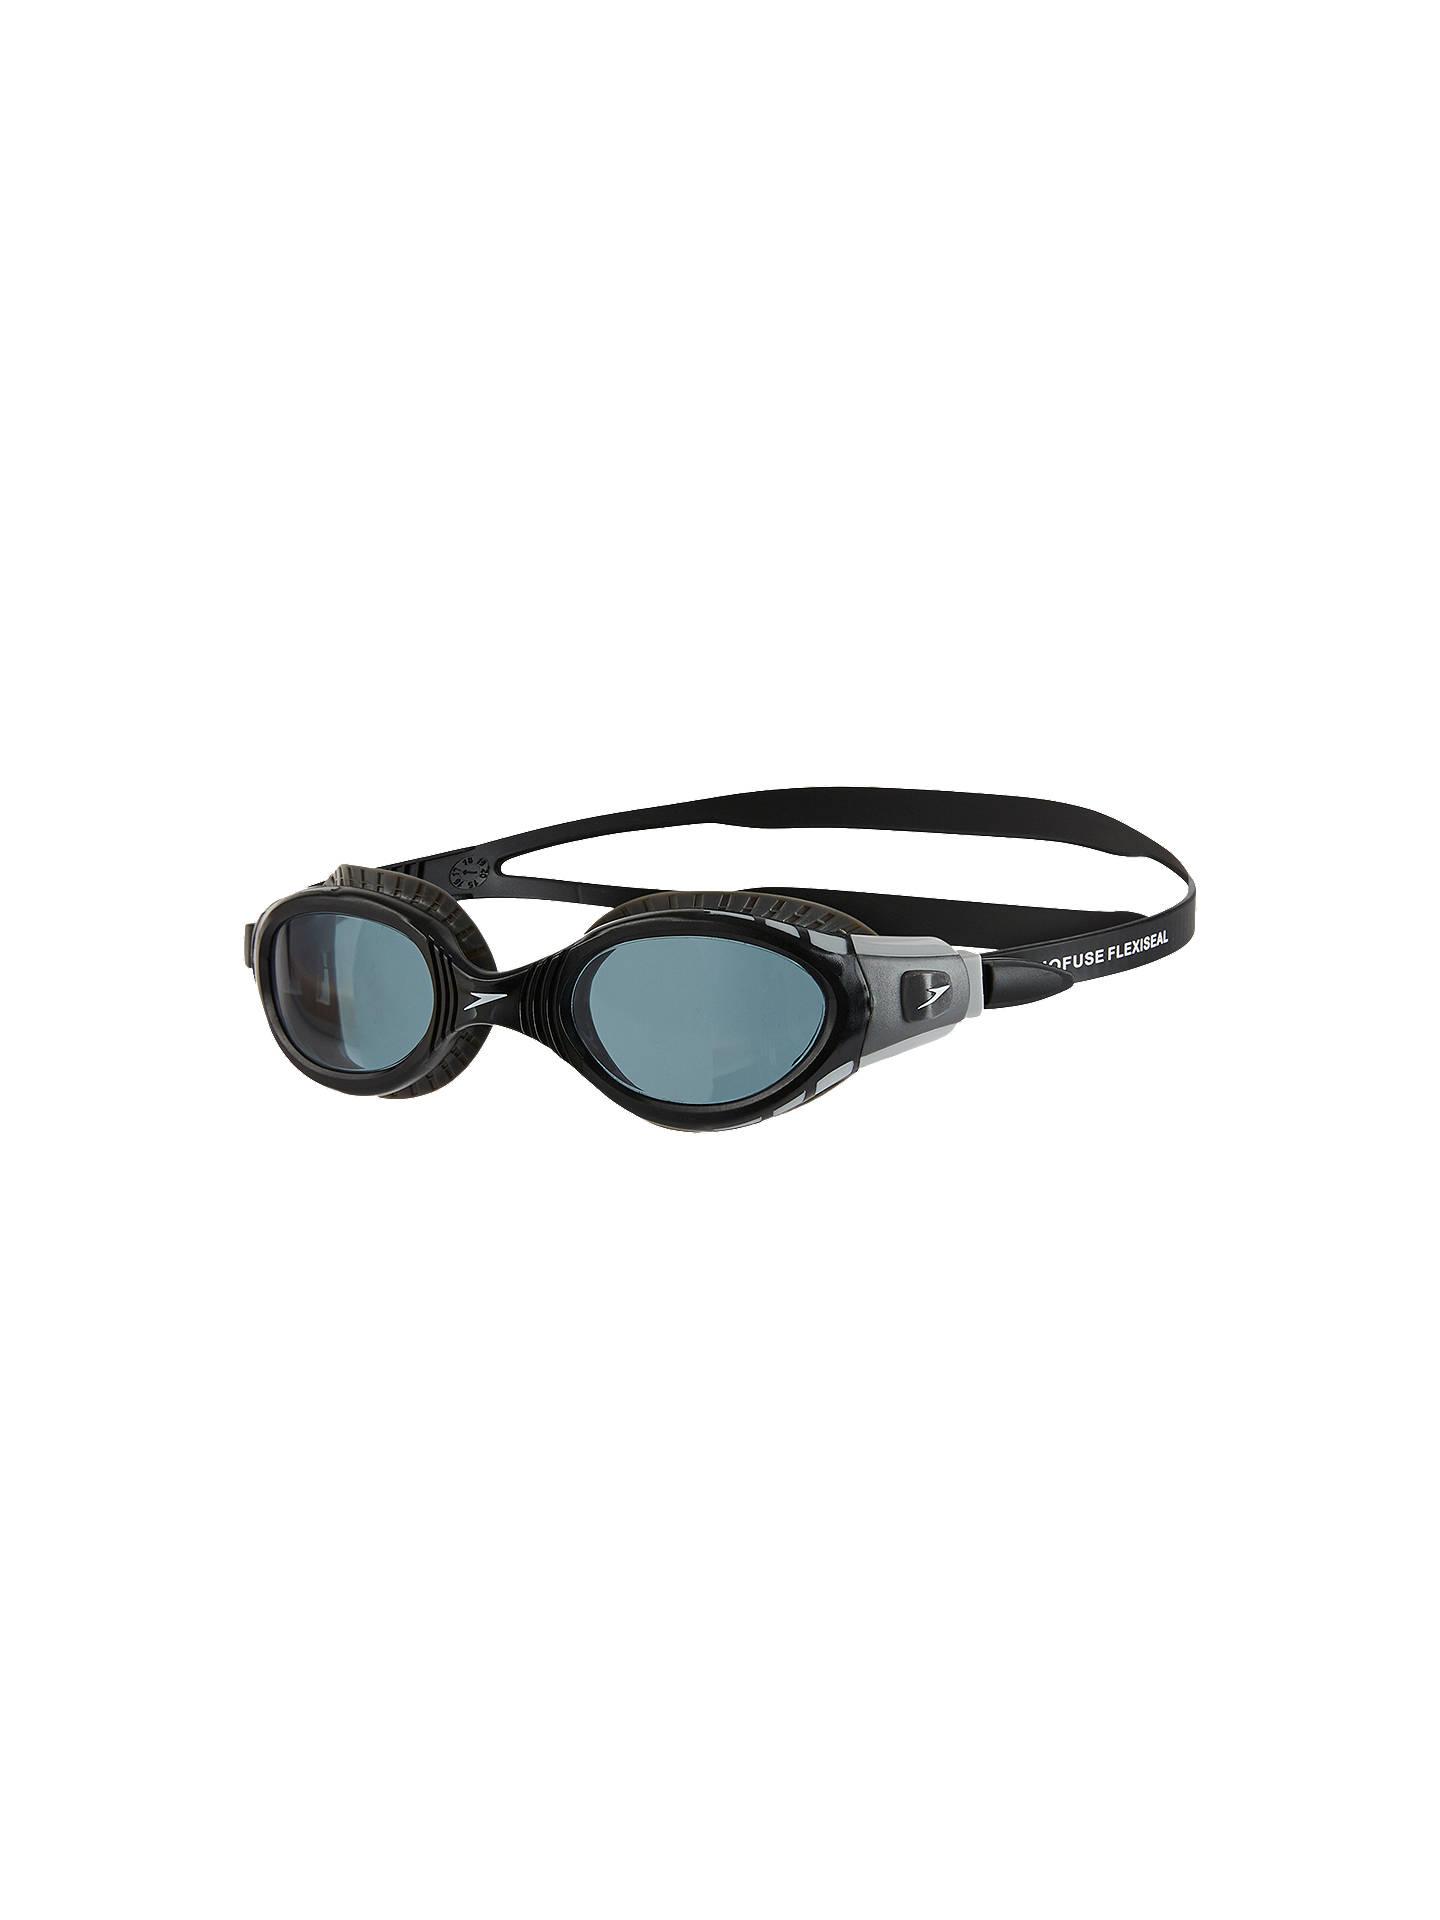 abc70d86ac7 Speedo Futura Biofuse Flexiseal Swimming Goggles at John Lewis ...